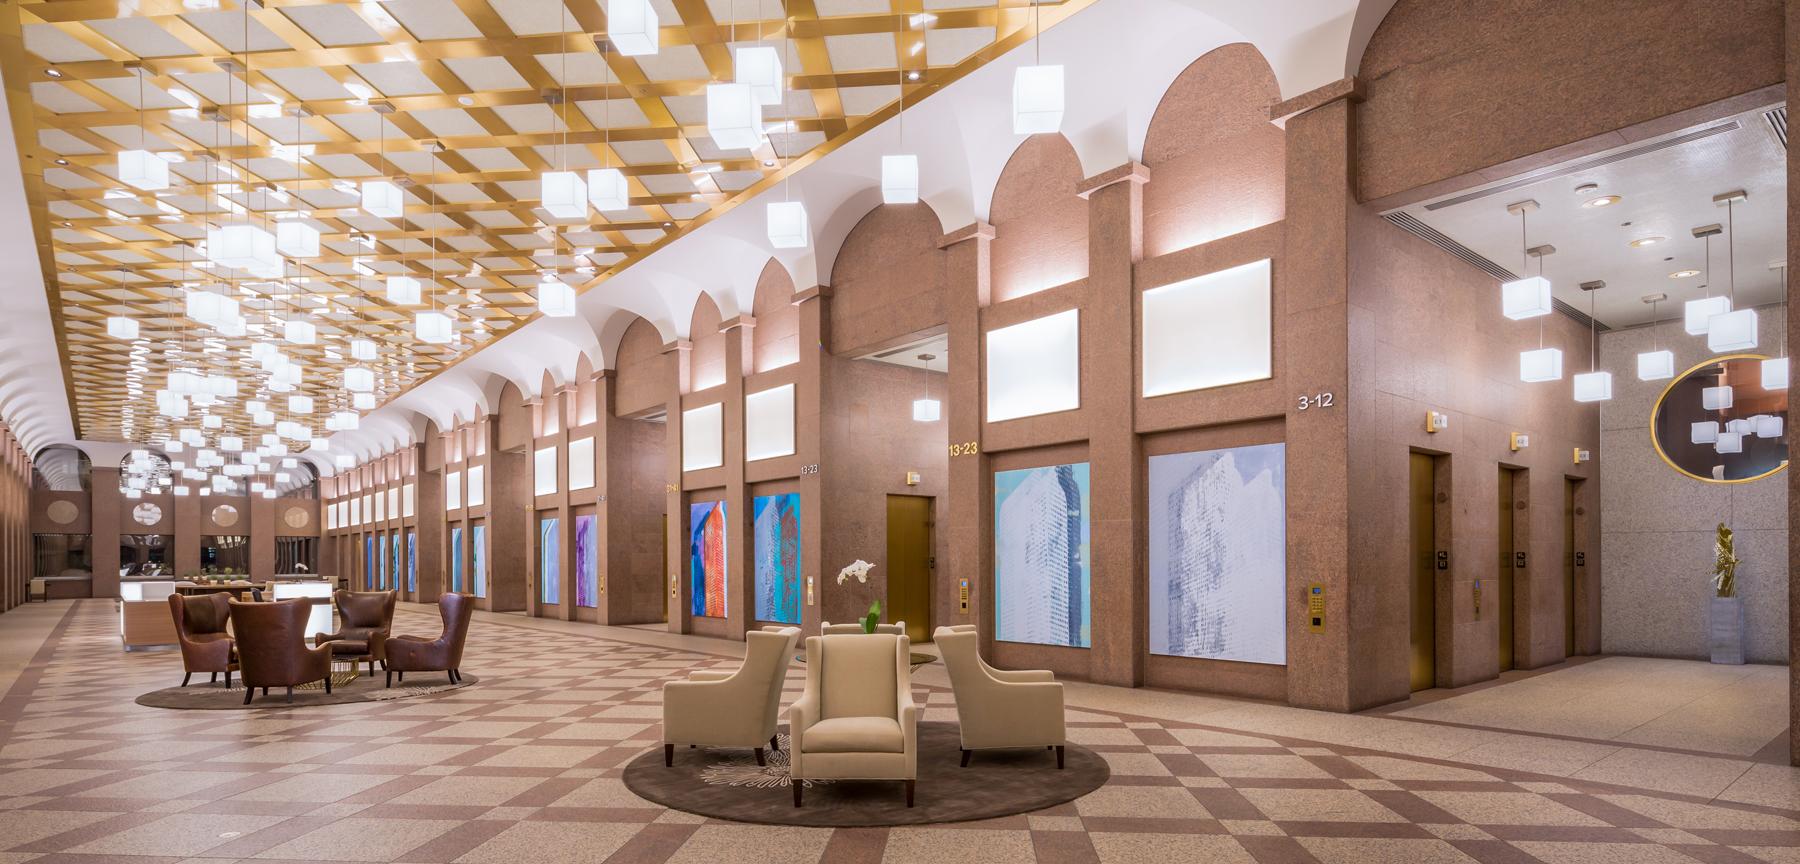 Wells Fargo elevator lobby